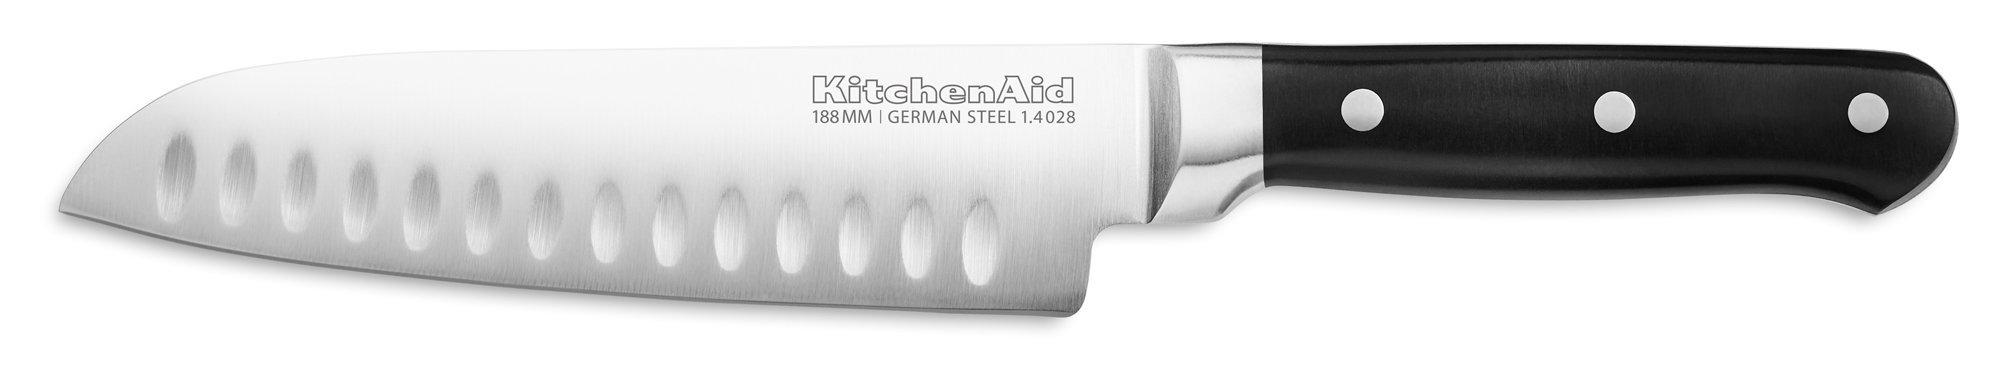 KitchenAid KKFTR7SKOB Classic Forged Series Triple Rivet Santoku Knife, Onyx Black, 7''